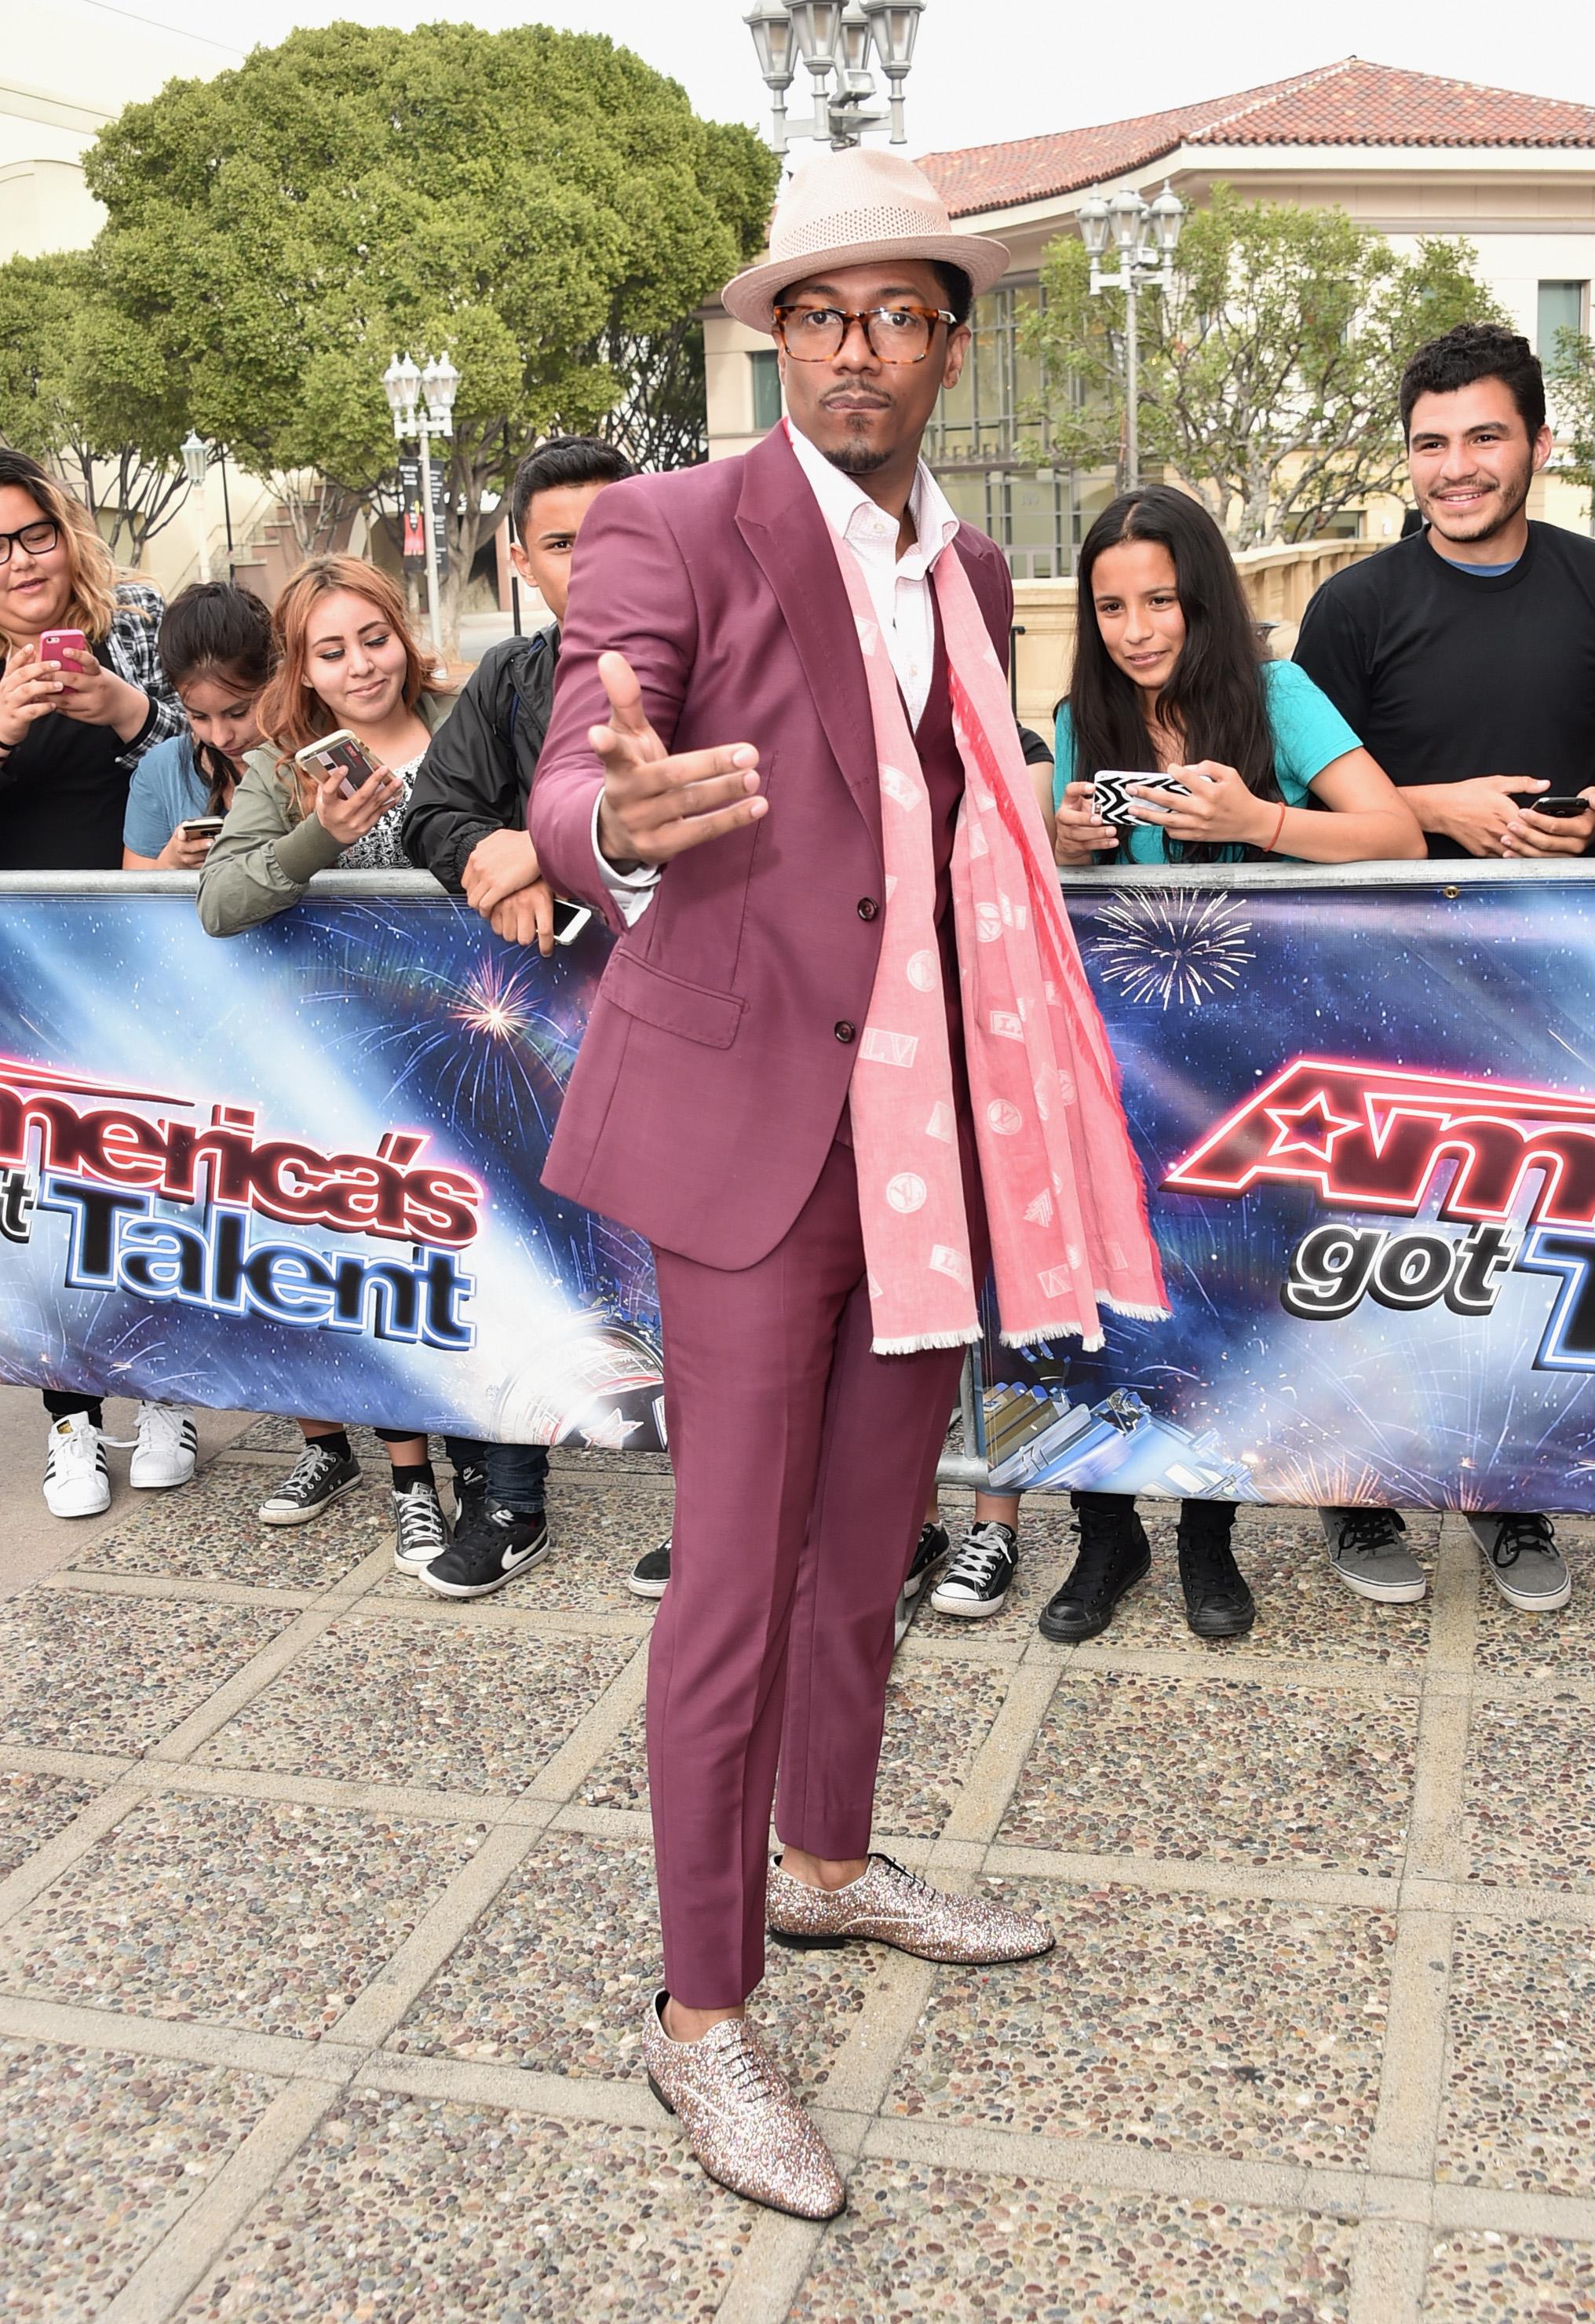 NBC's 'America's Got Talent' Season 11 Kickoff - Arrivals